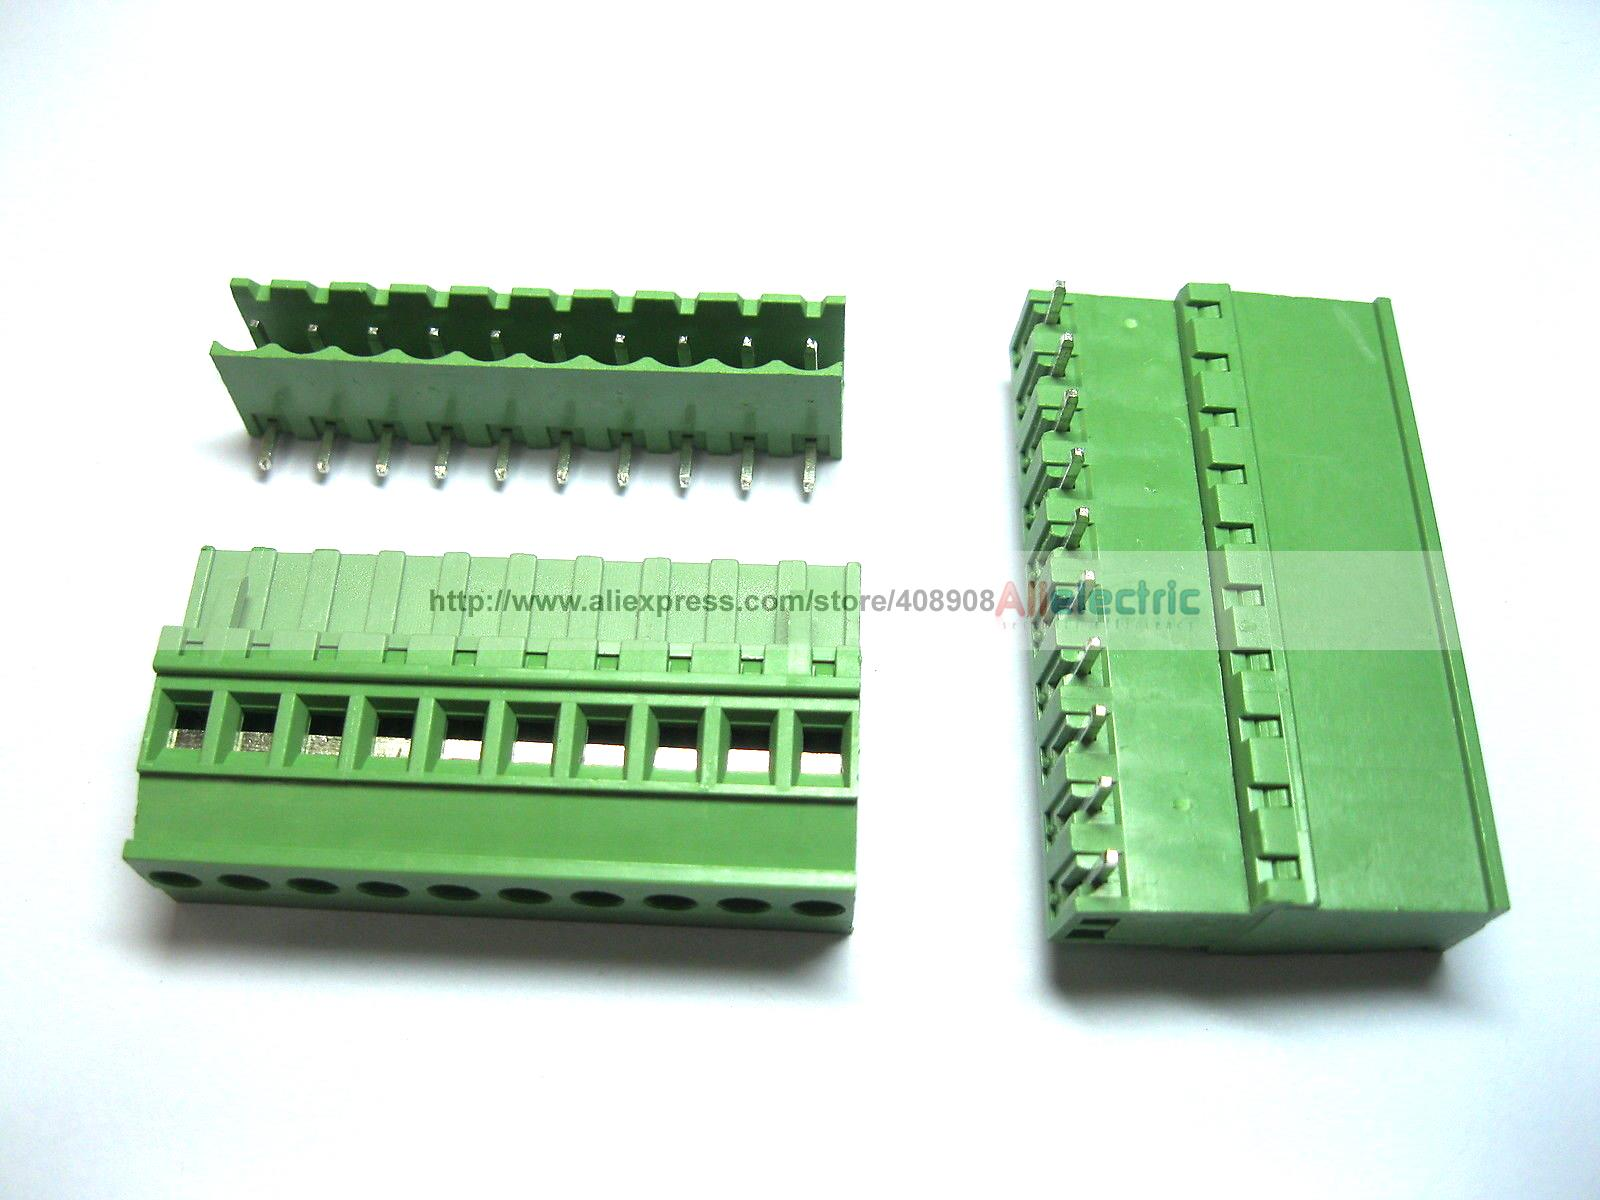 24 Pcs 5.08A 5.08mm Angle 10 Pin Screw Terminal Block Connector Pluggable Type 40 pcs 5 08mm angle 10 pin screw terminal block connector pluggable type green